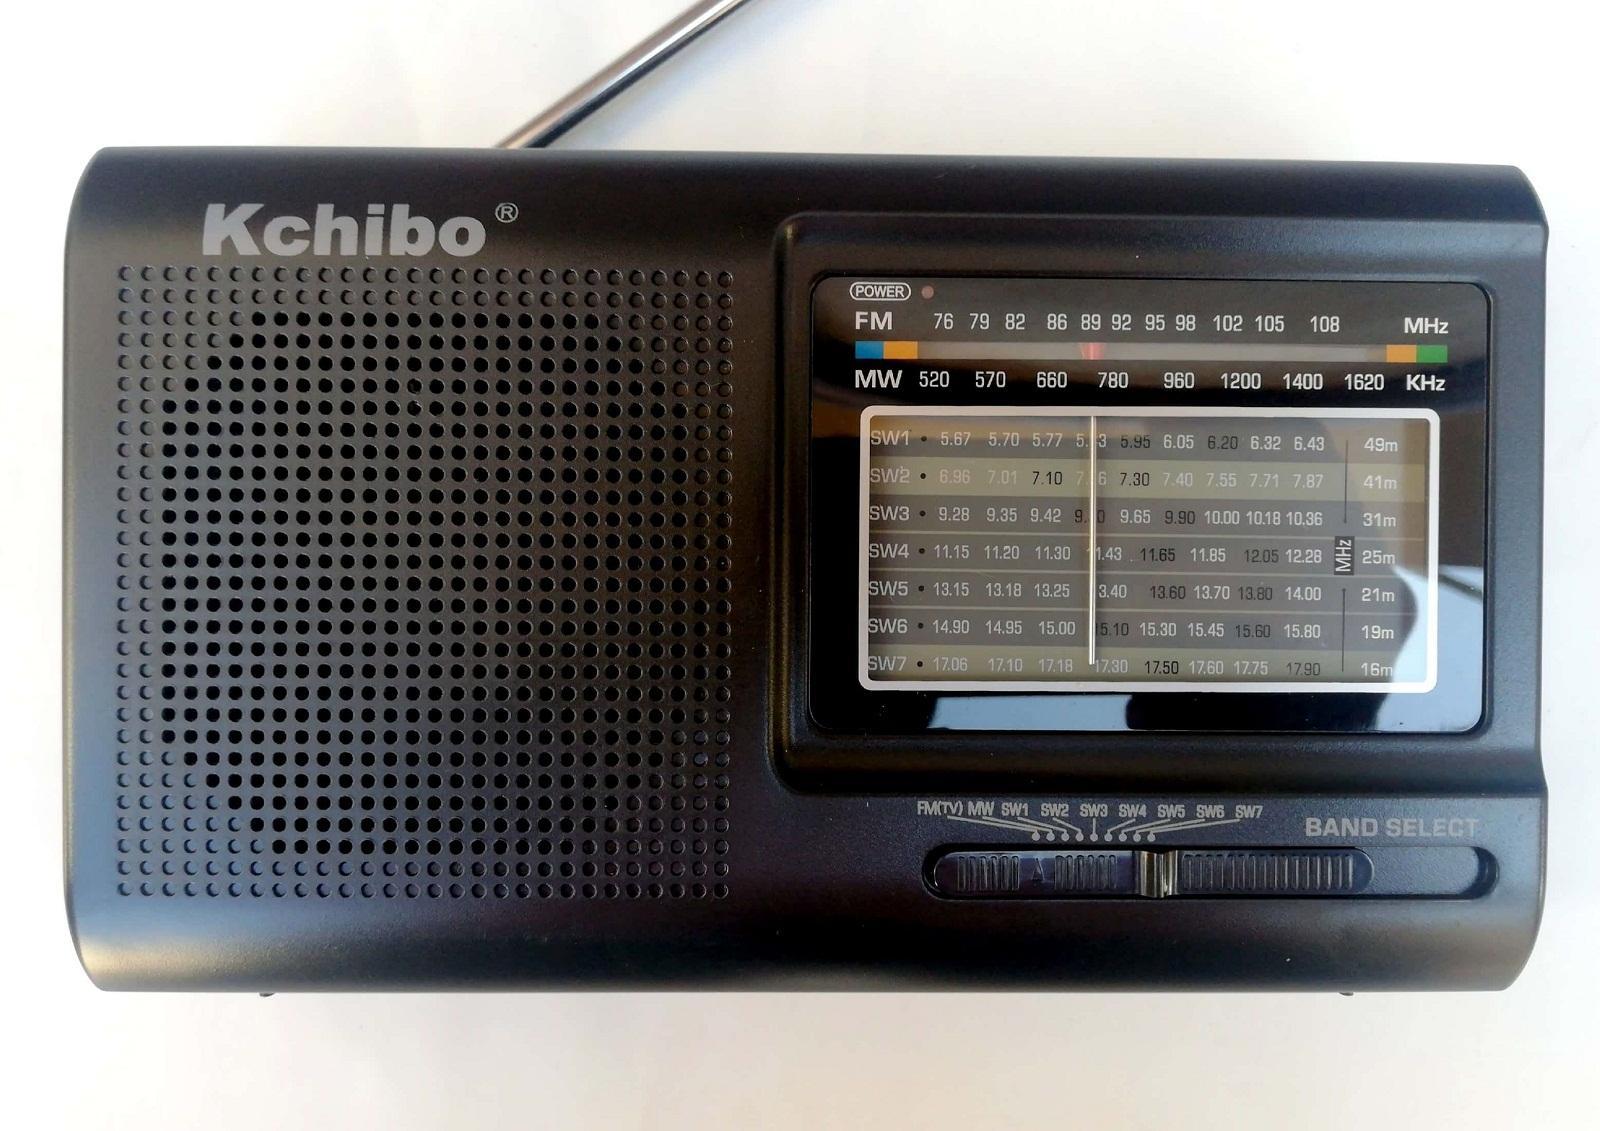 KCHIBO Portable 9 Band World Receiver Radio FM (TV1)/MW/SW1-7